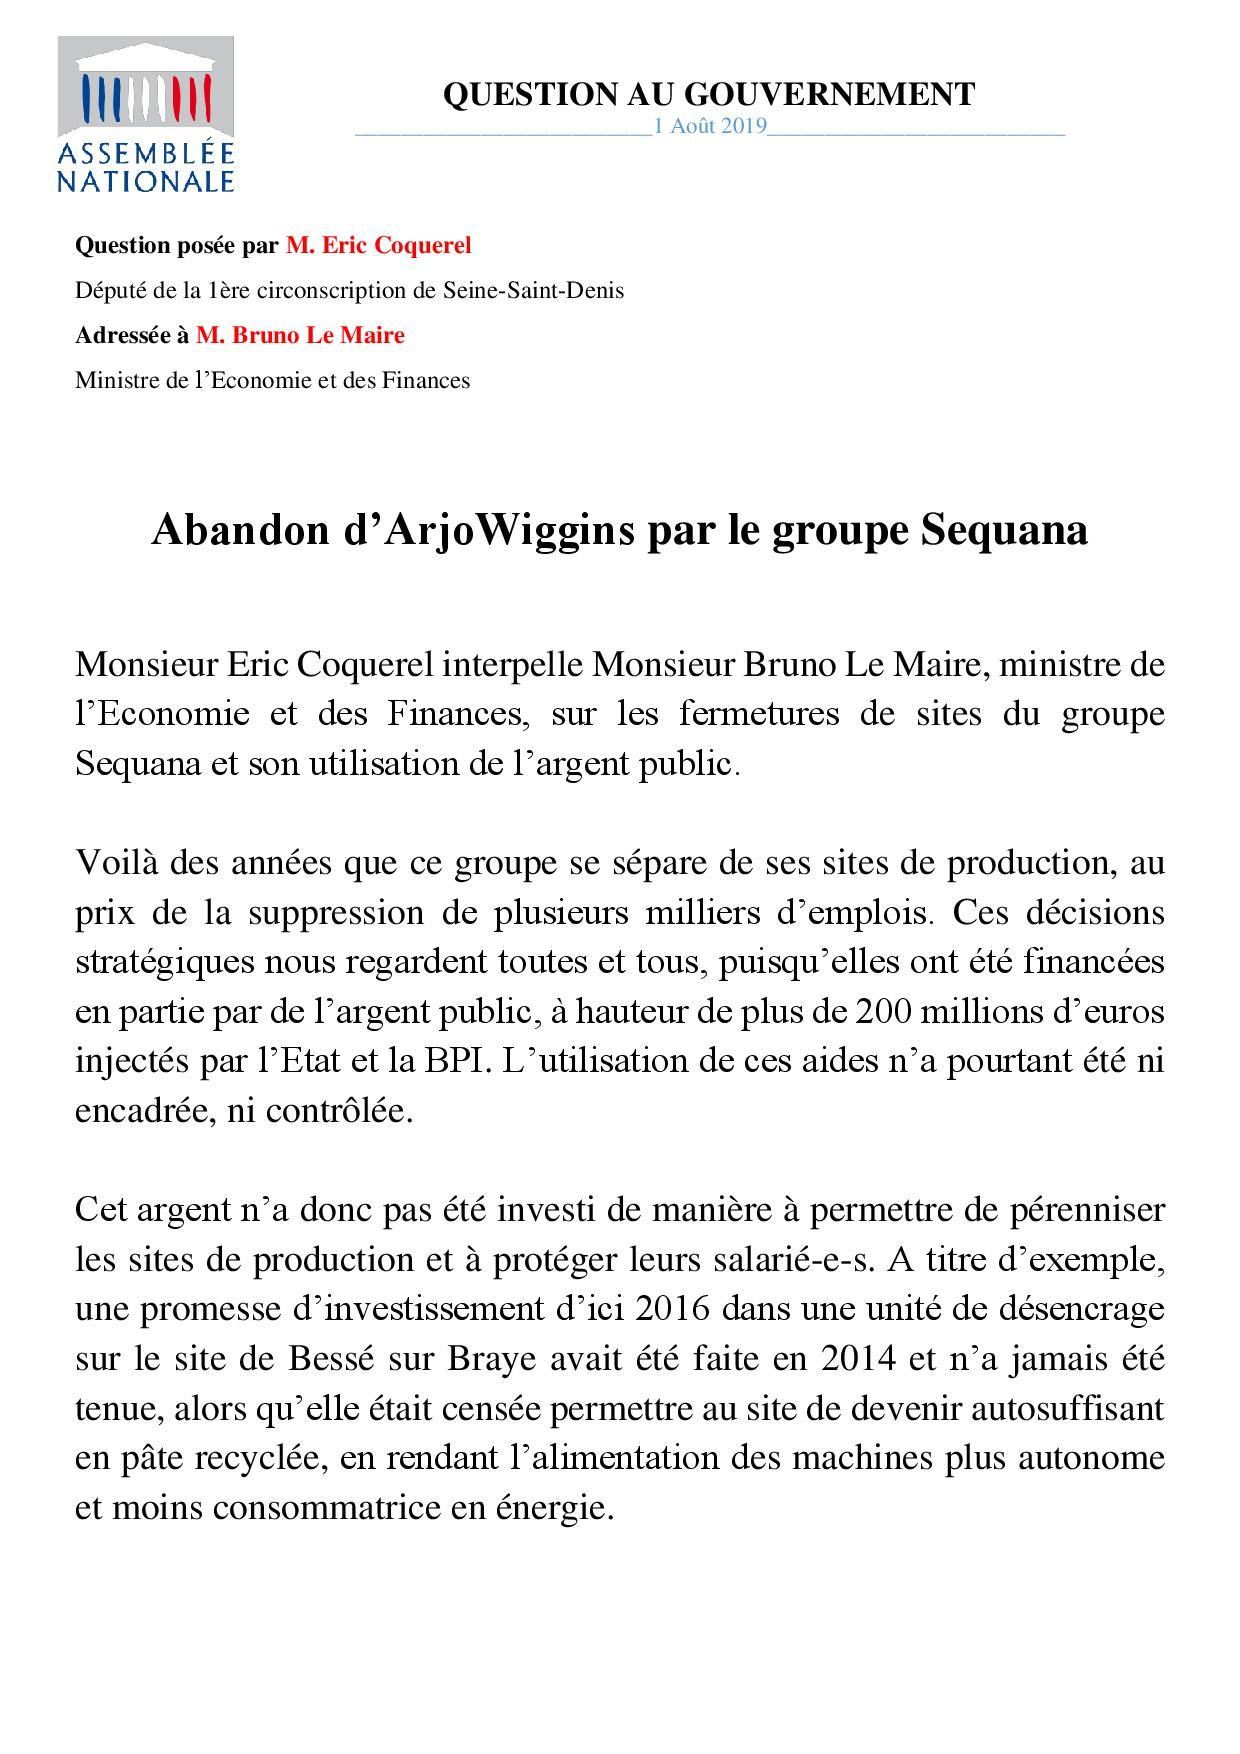 29-07-2019 salariés ArjoWiggins Sarthes v2-page-001